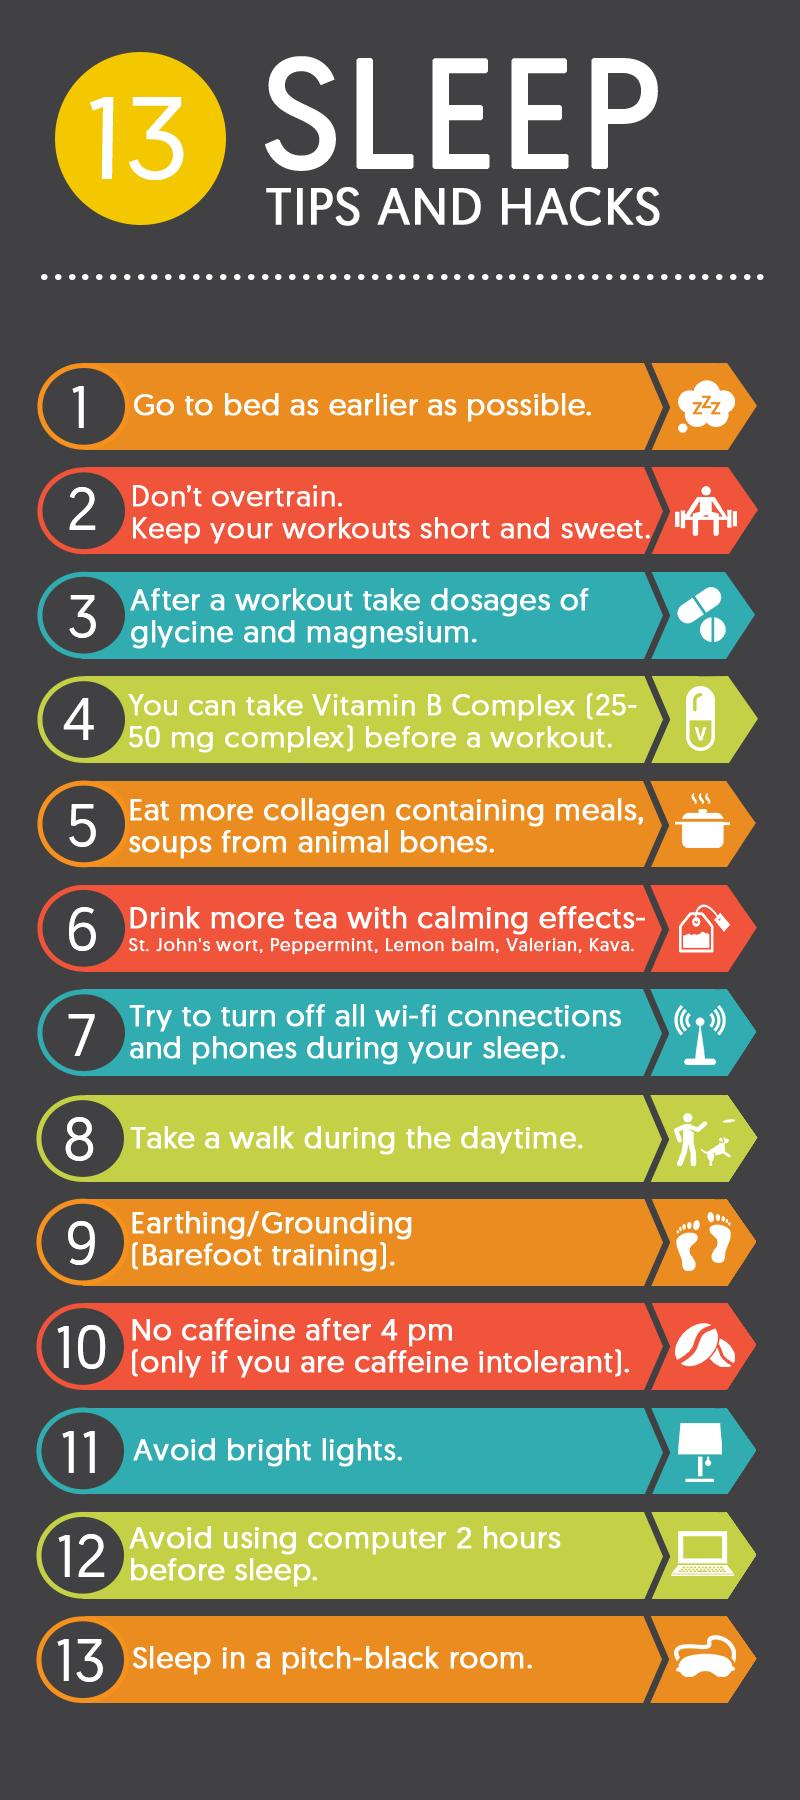 13 Sleep Tips and Hacks for You to Follow